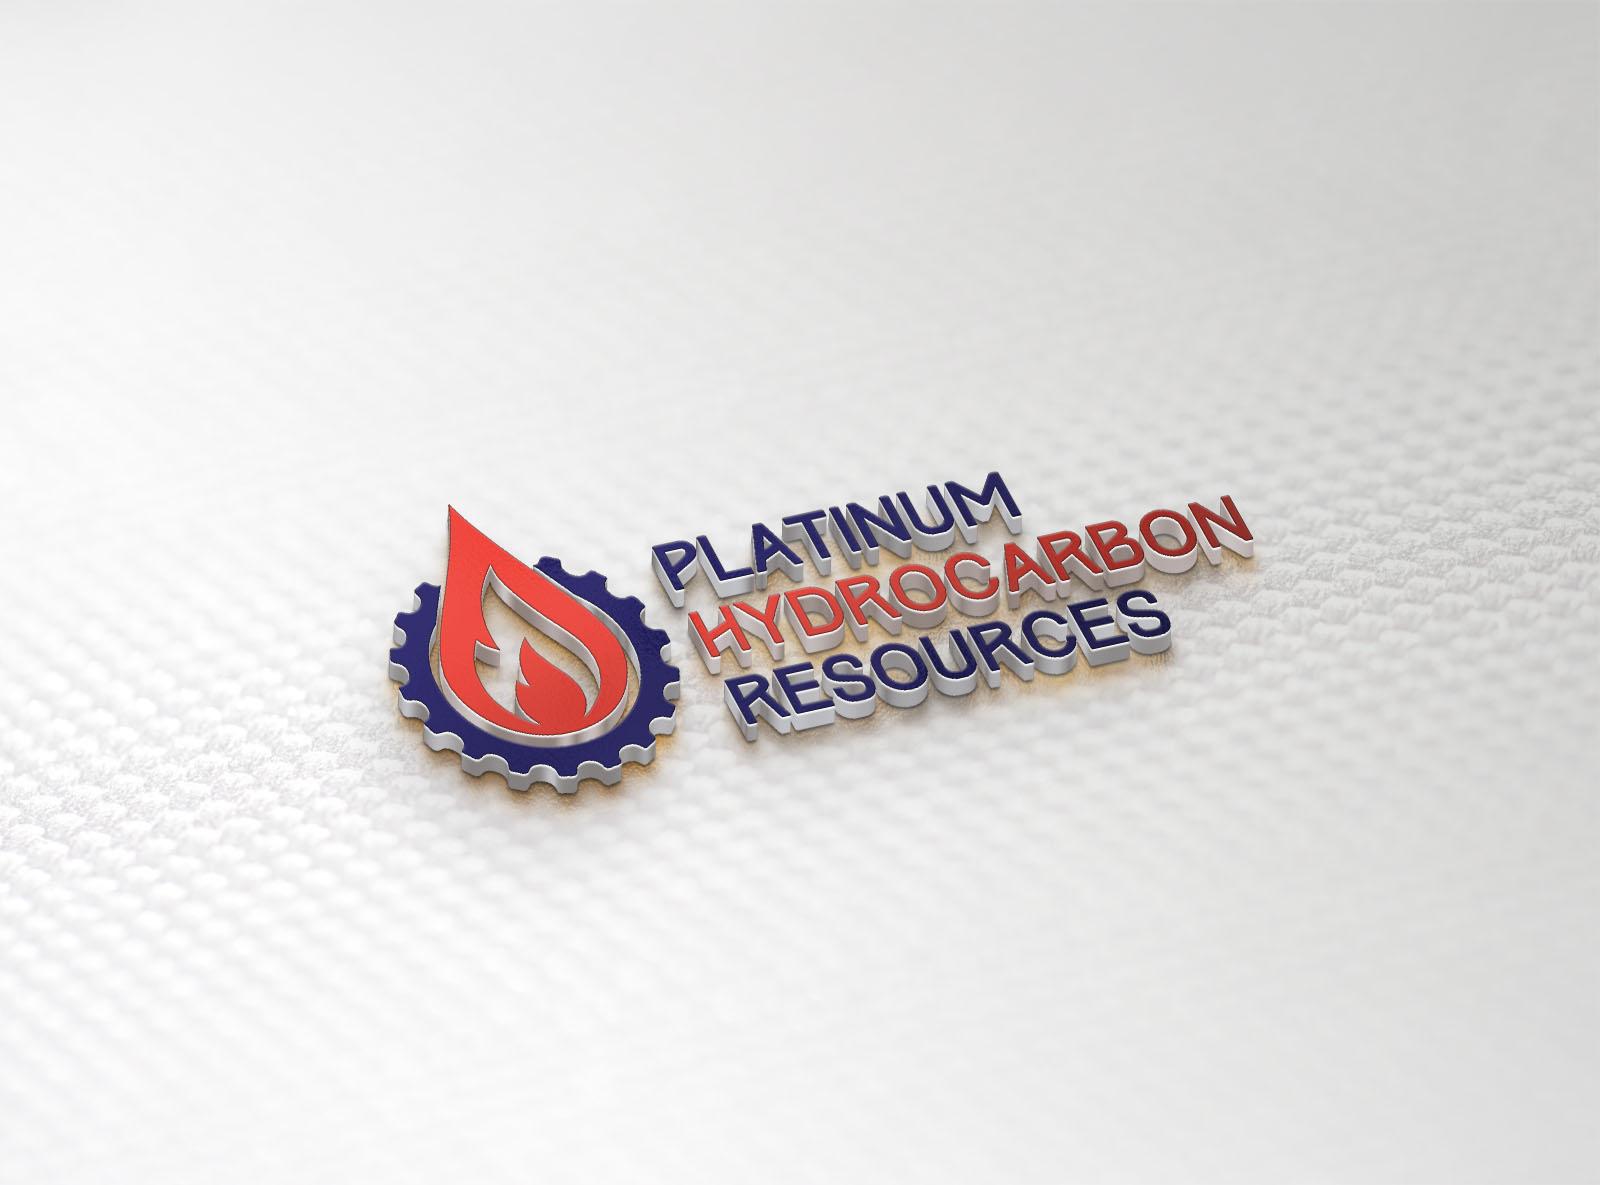 Platinum Hydrocarbon Resources logo